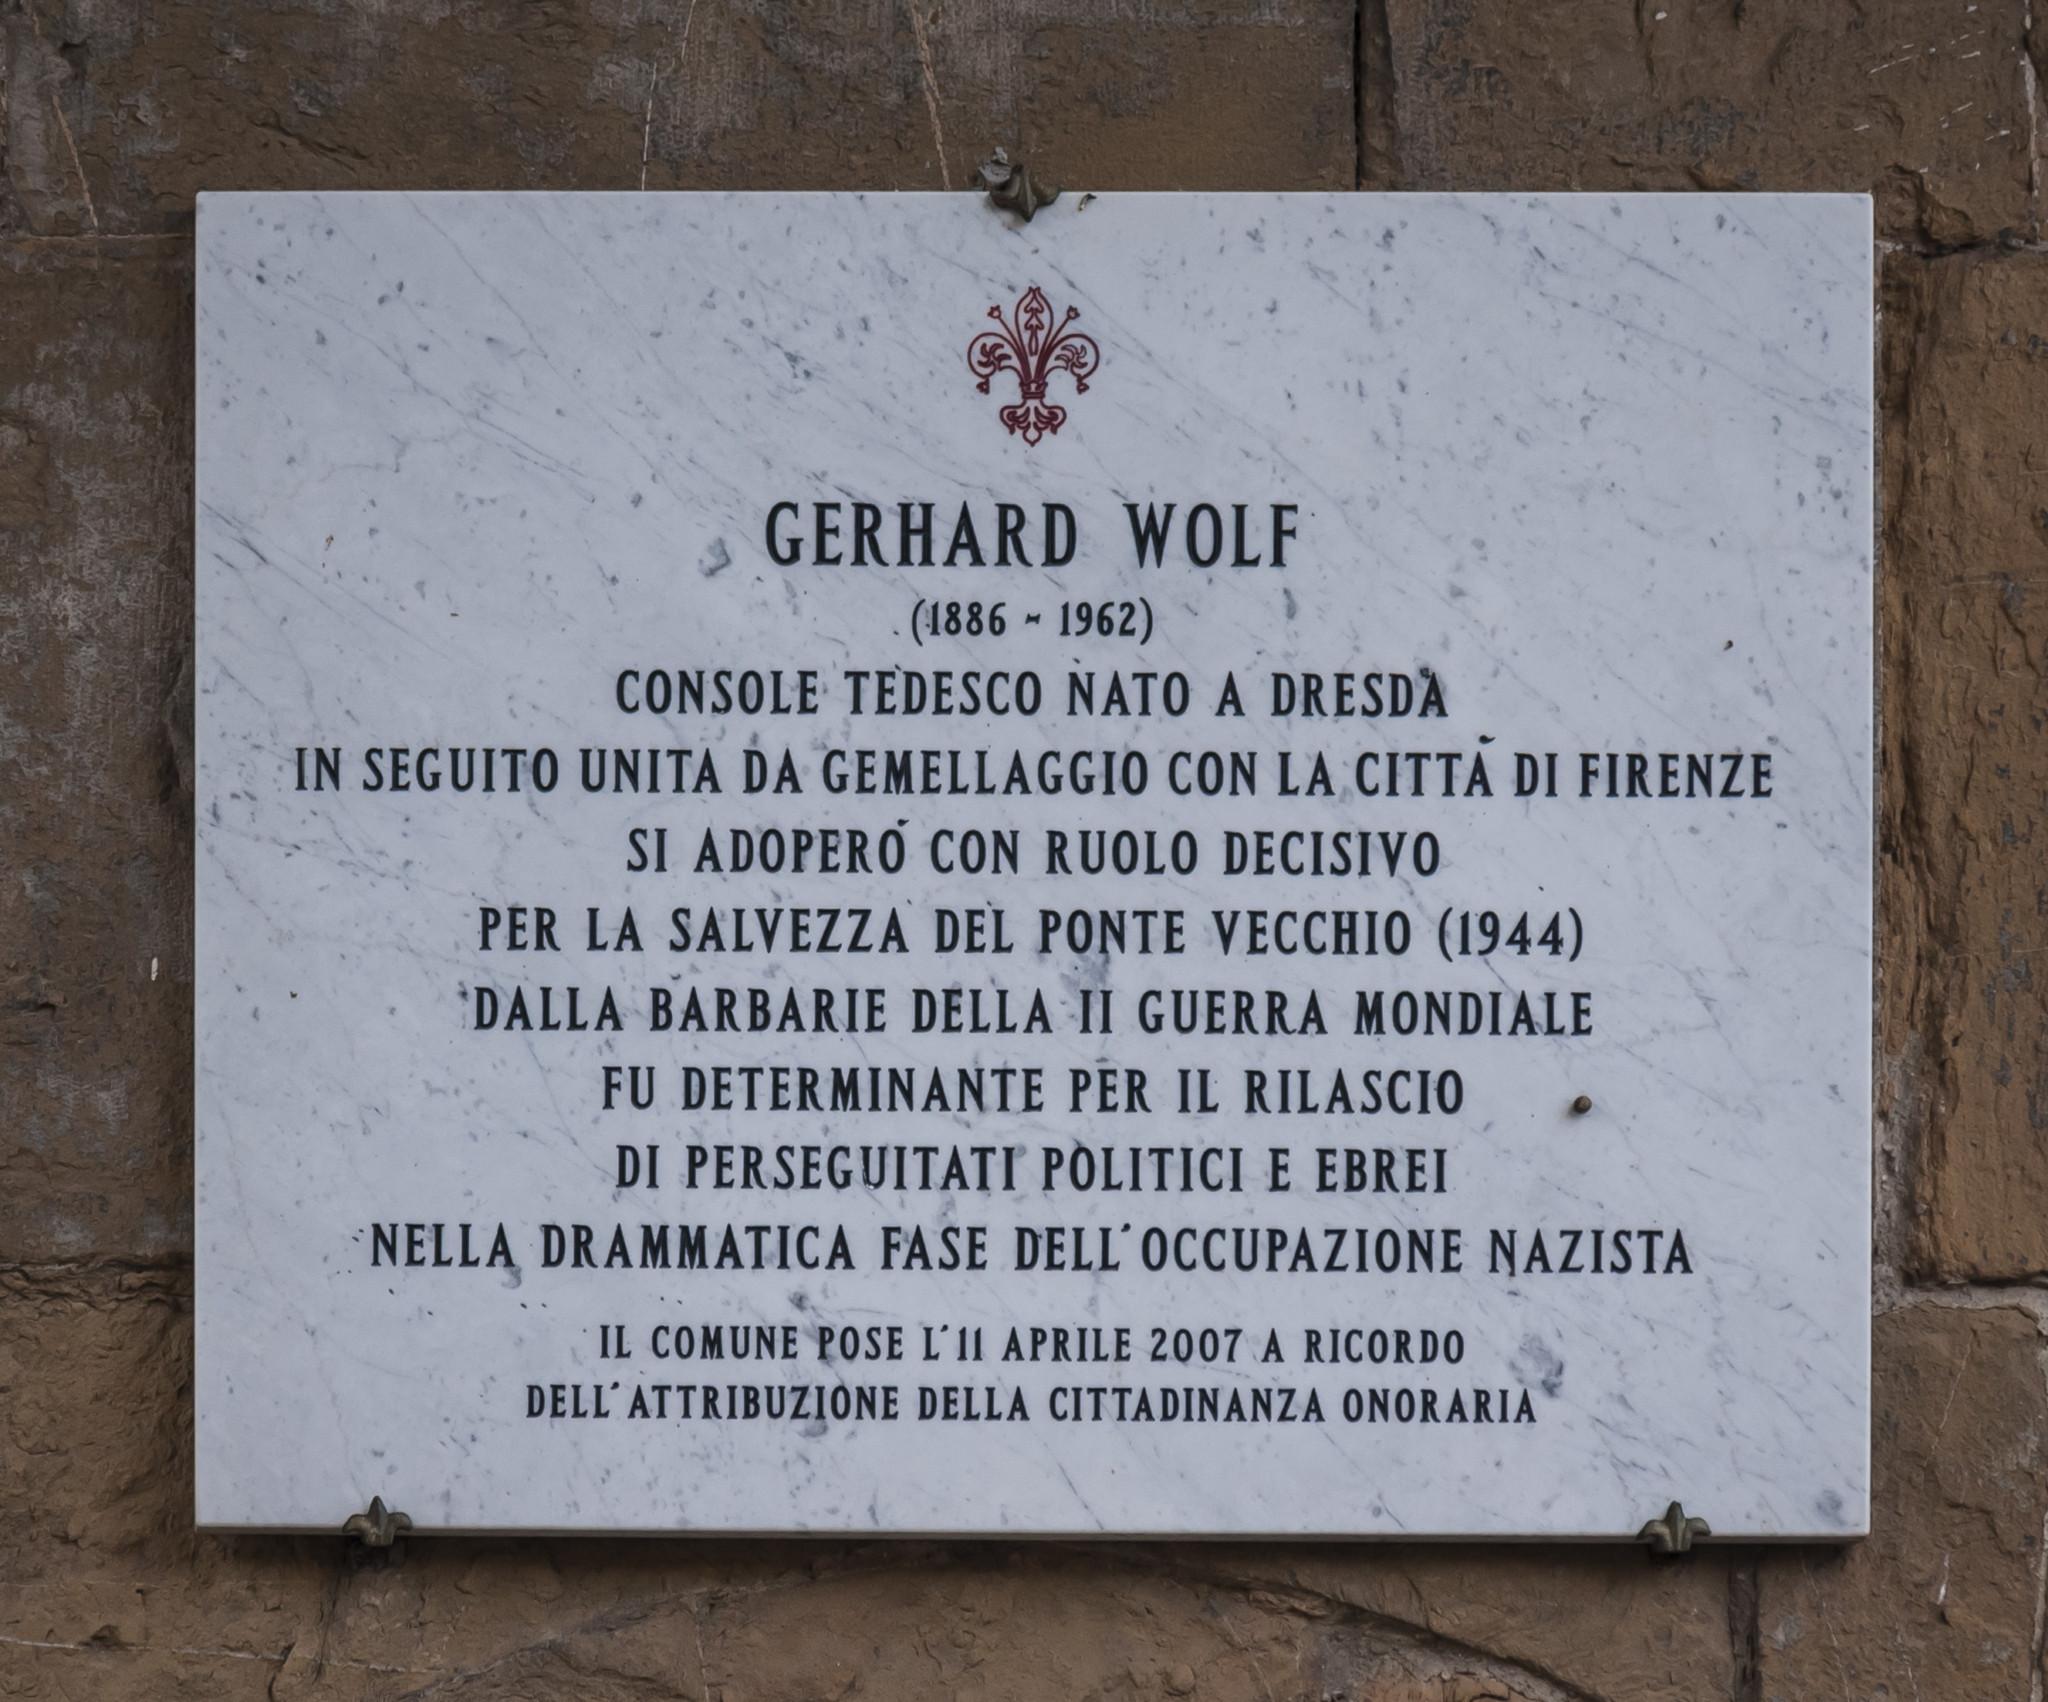 ponteveccio-firence_inscriptiongerhardwolf